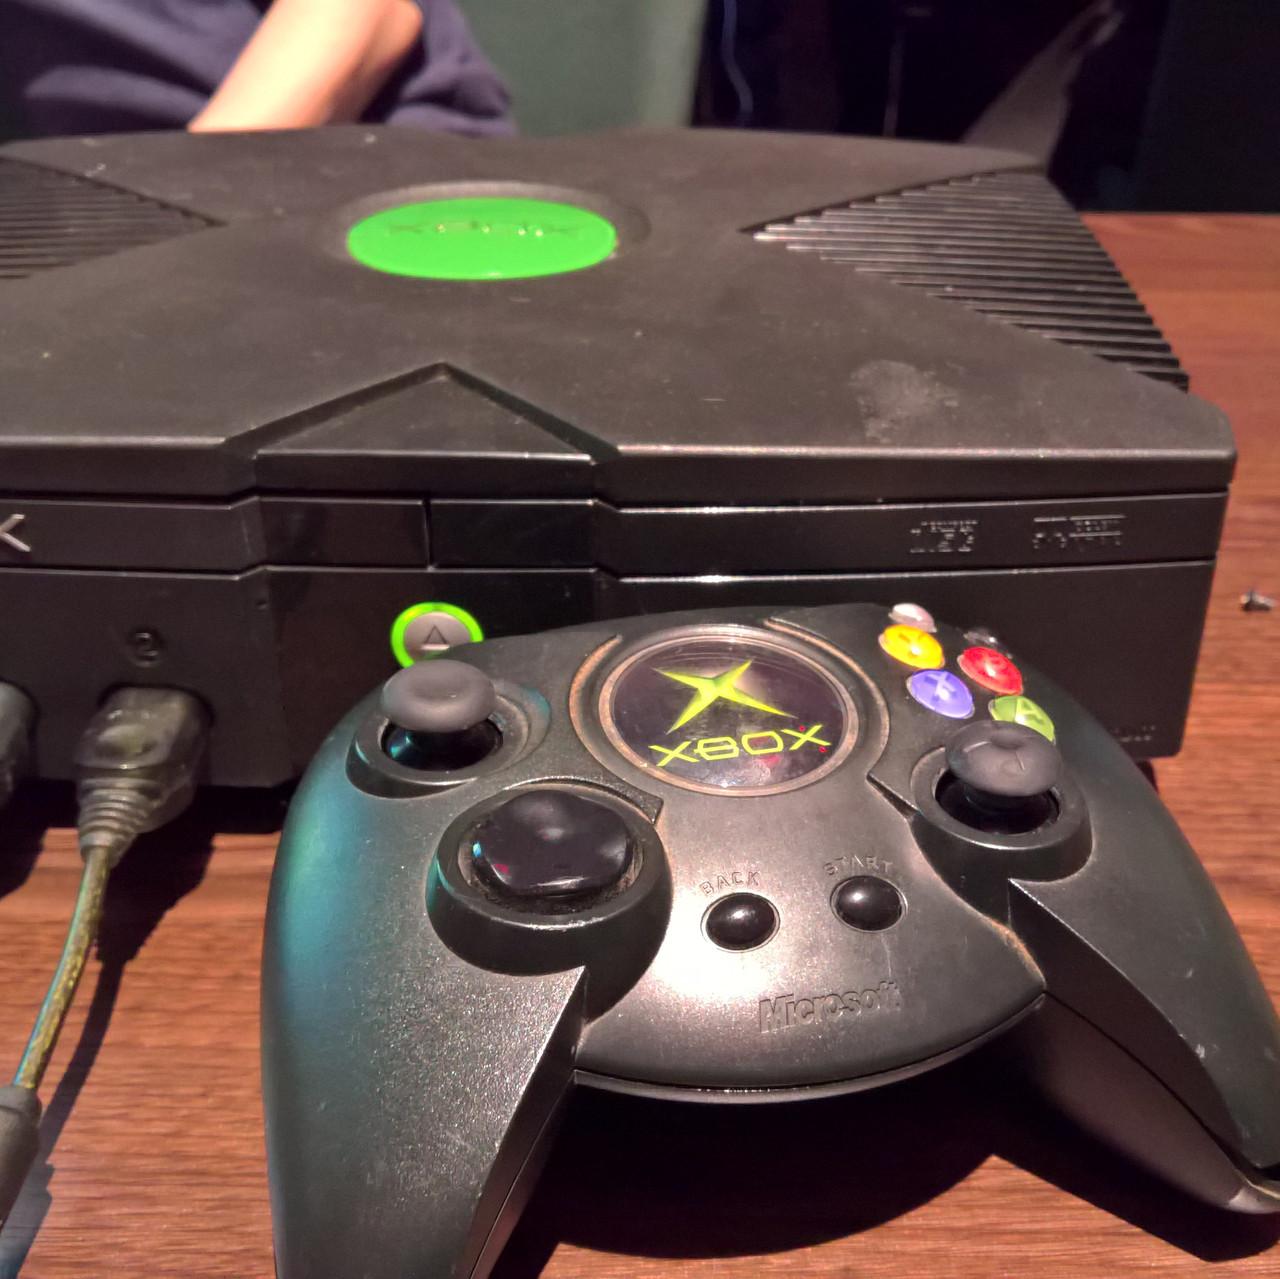 Original Xbox and Duke Controller